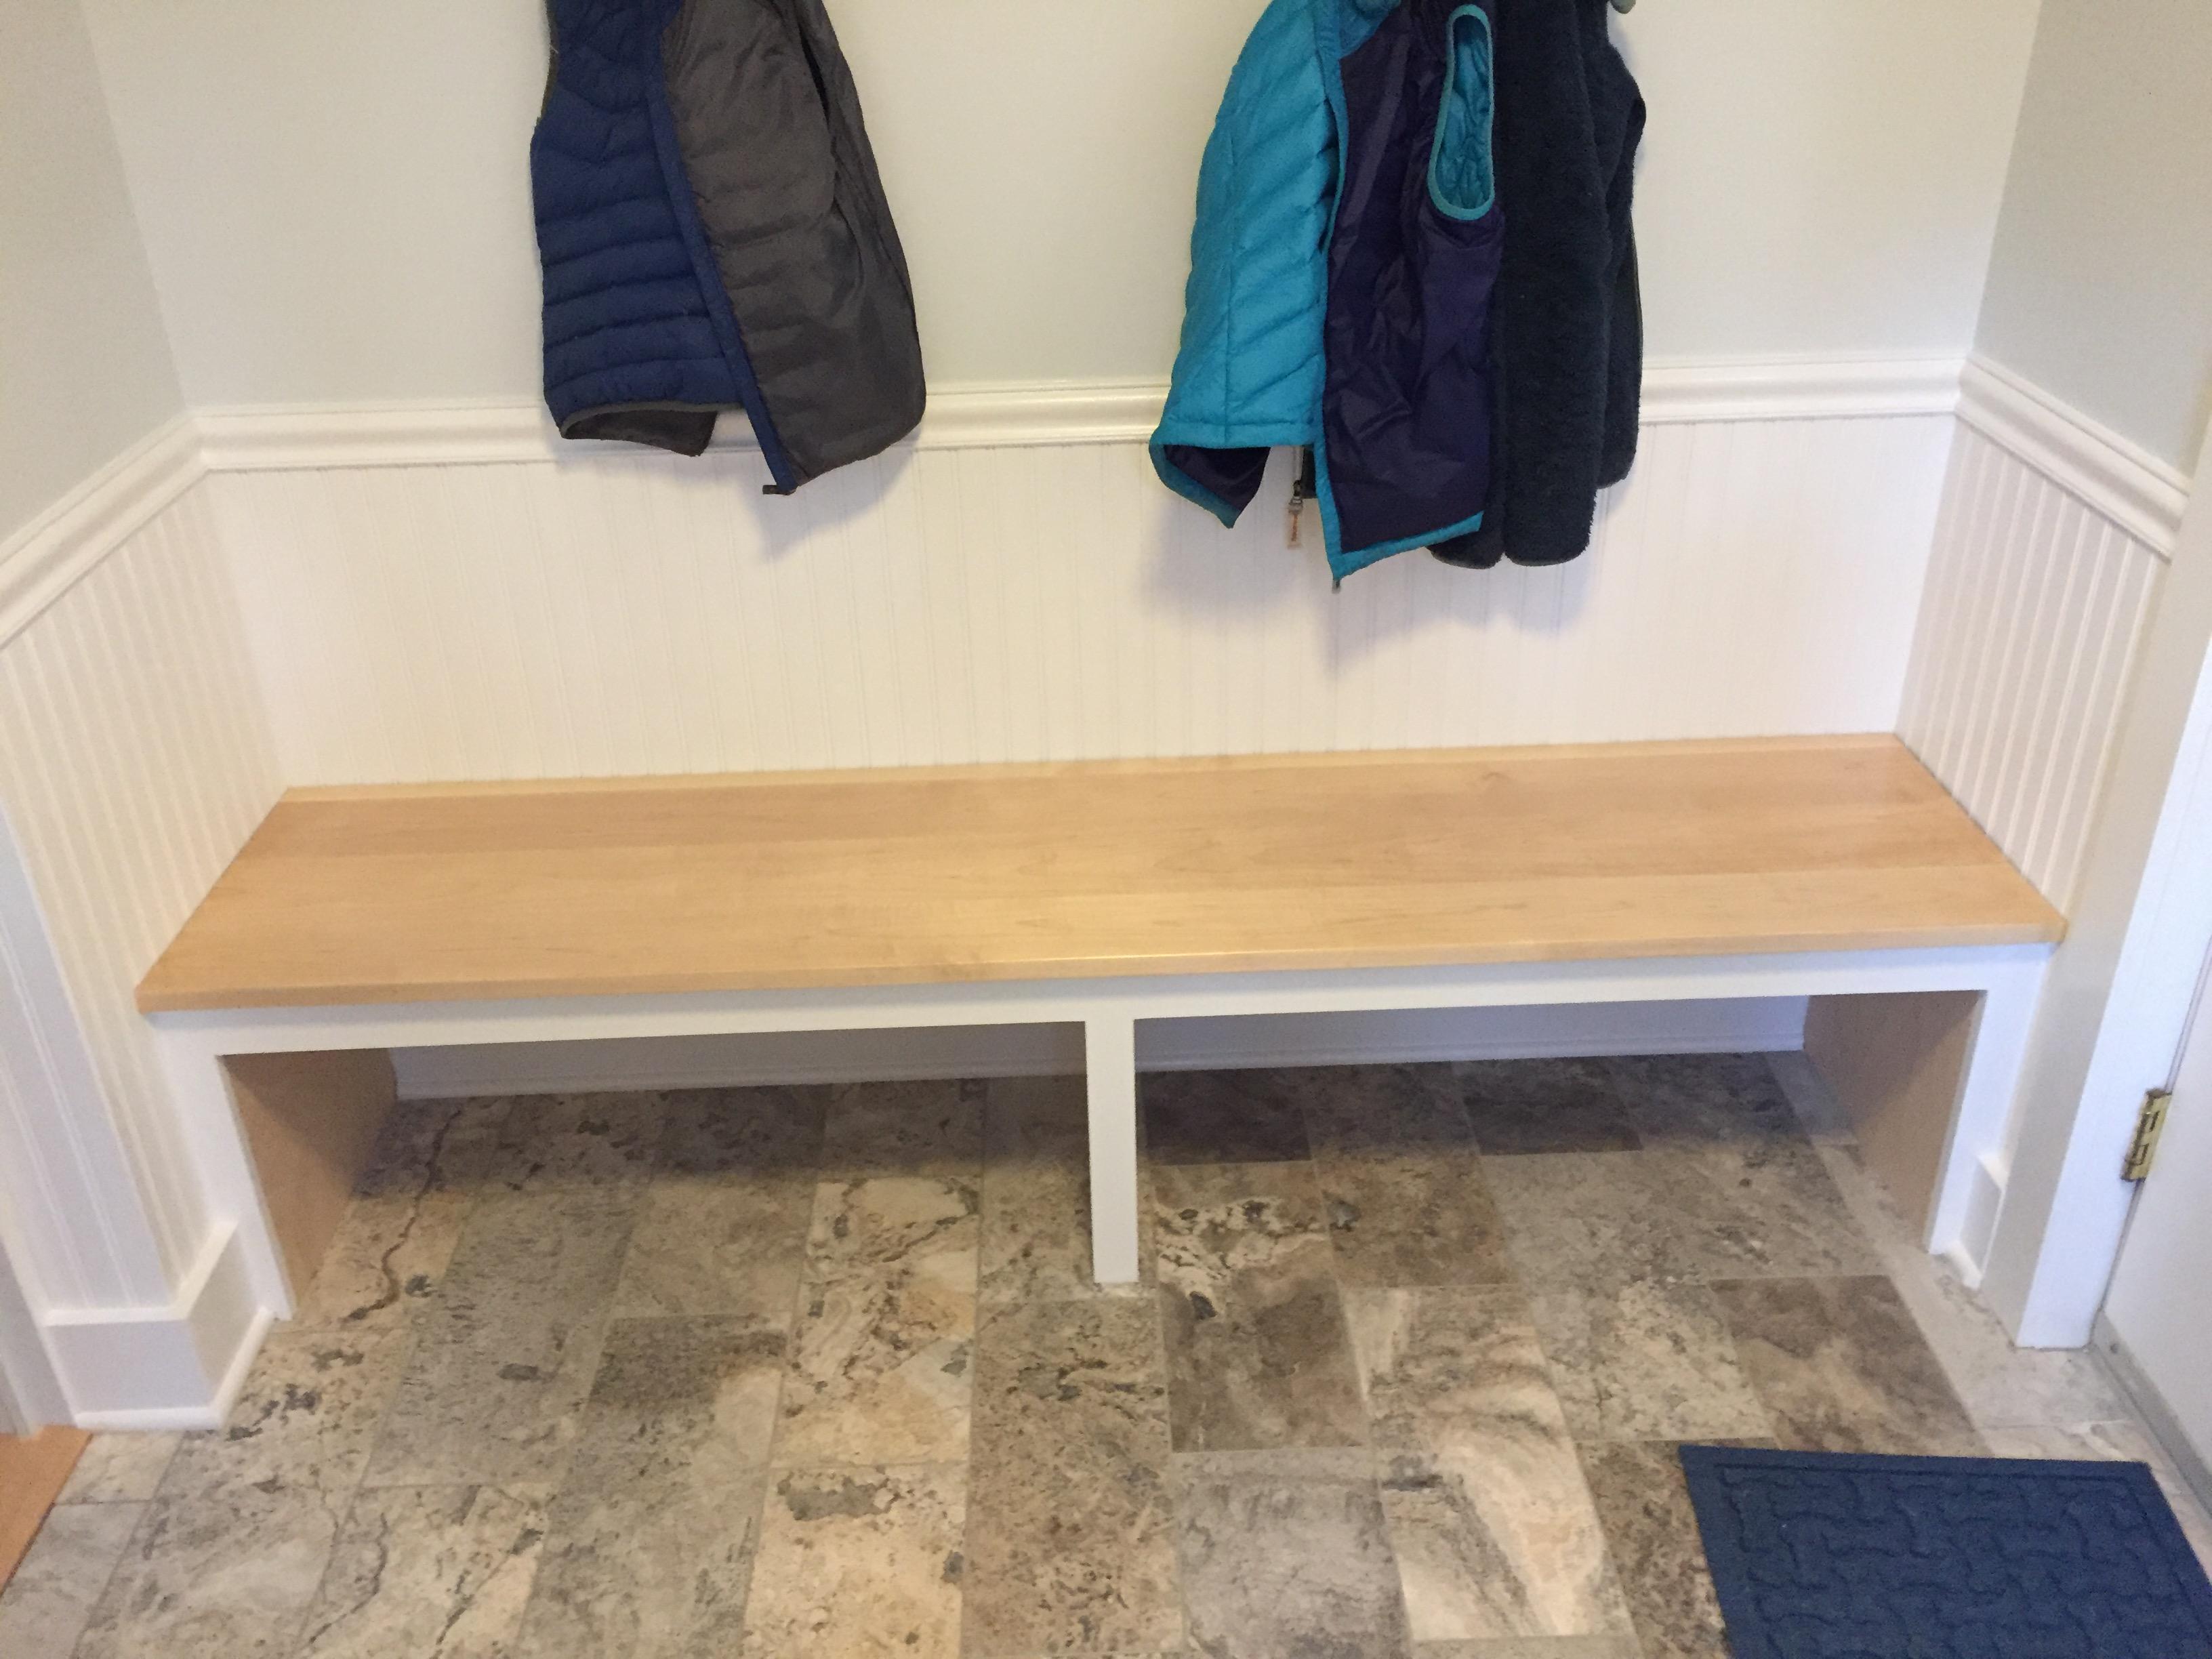 Mudroom Bench Seat